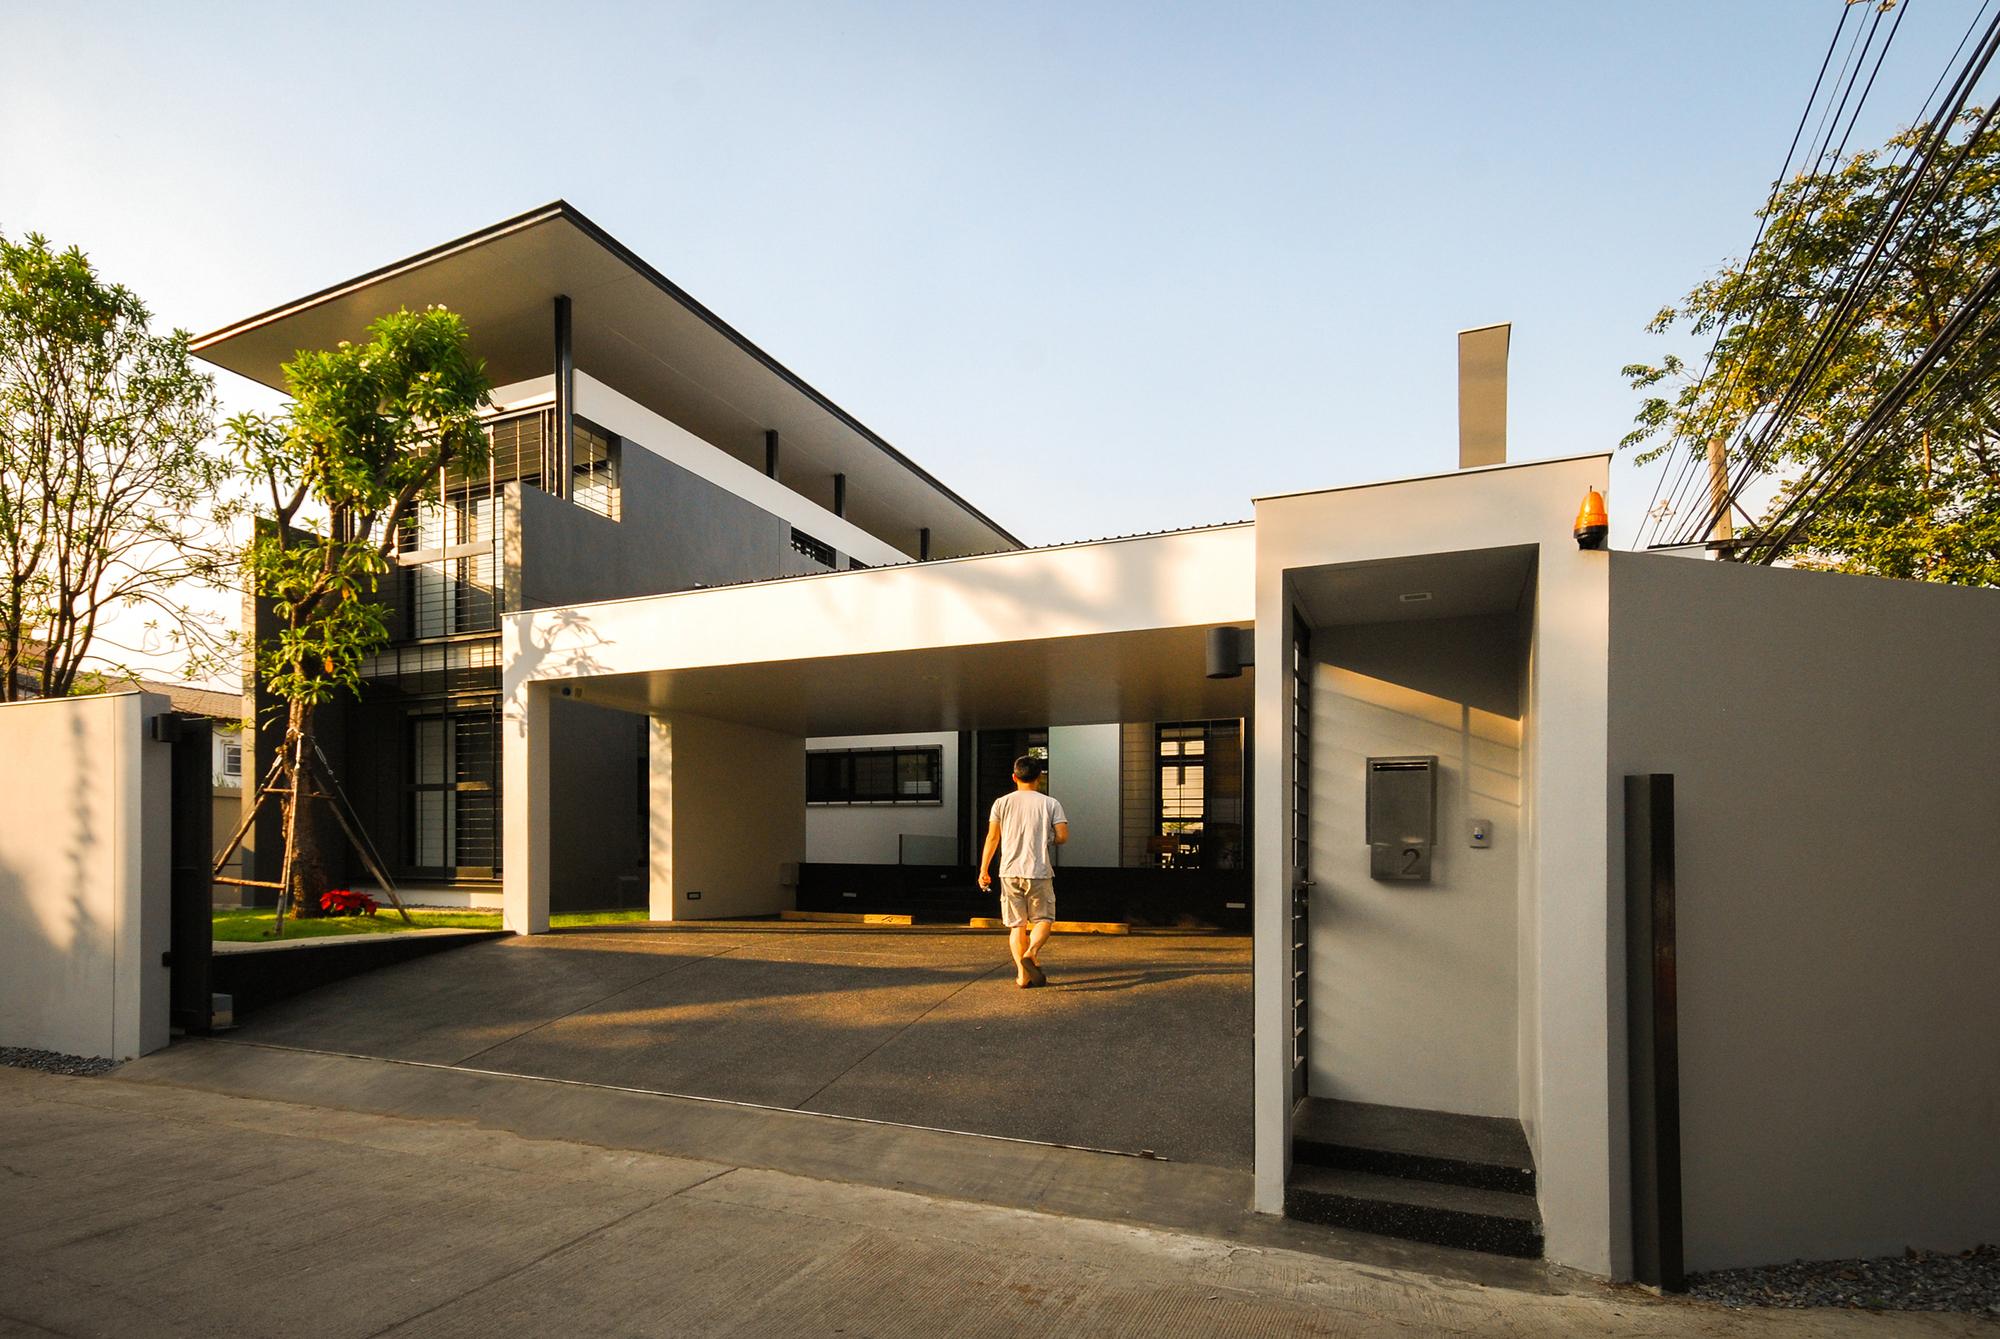 Three House Junsekino Architect And Design Archdaily